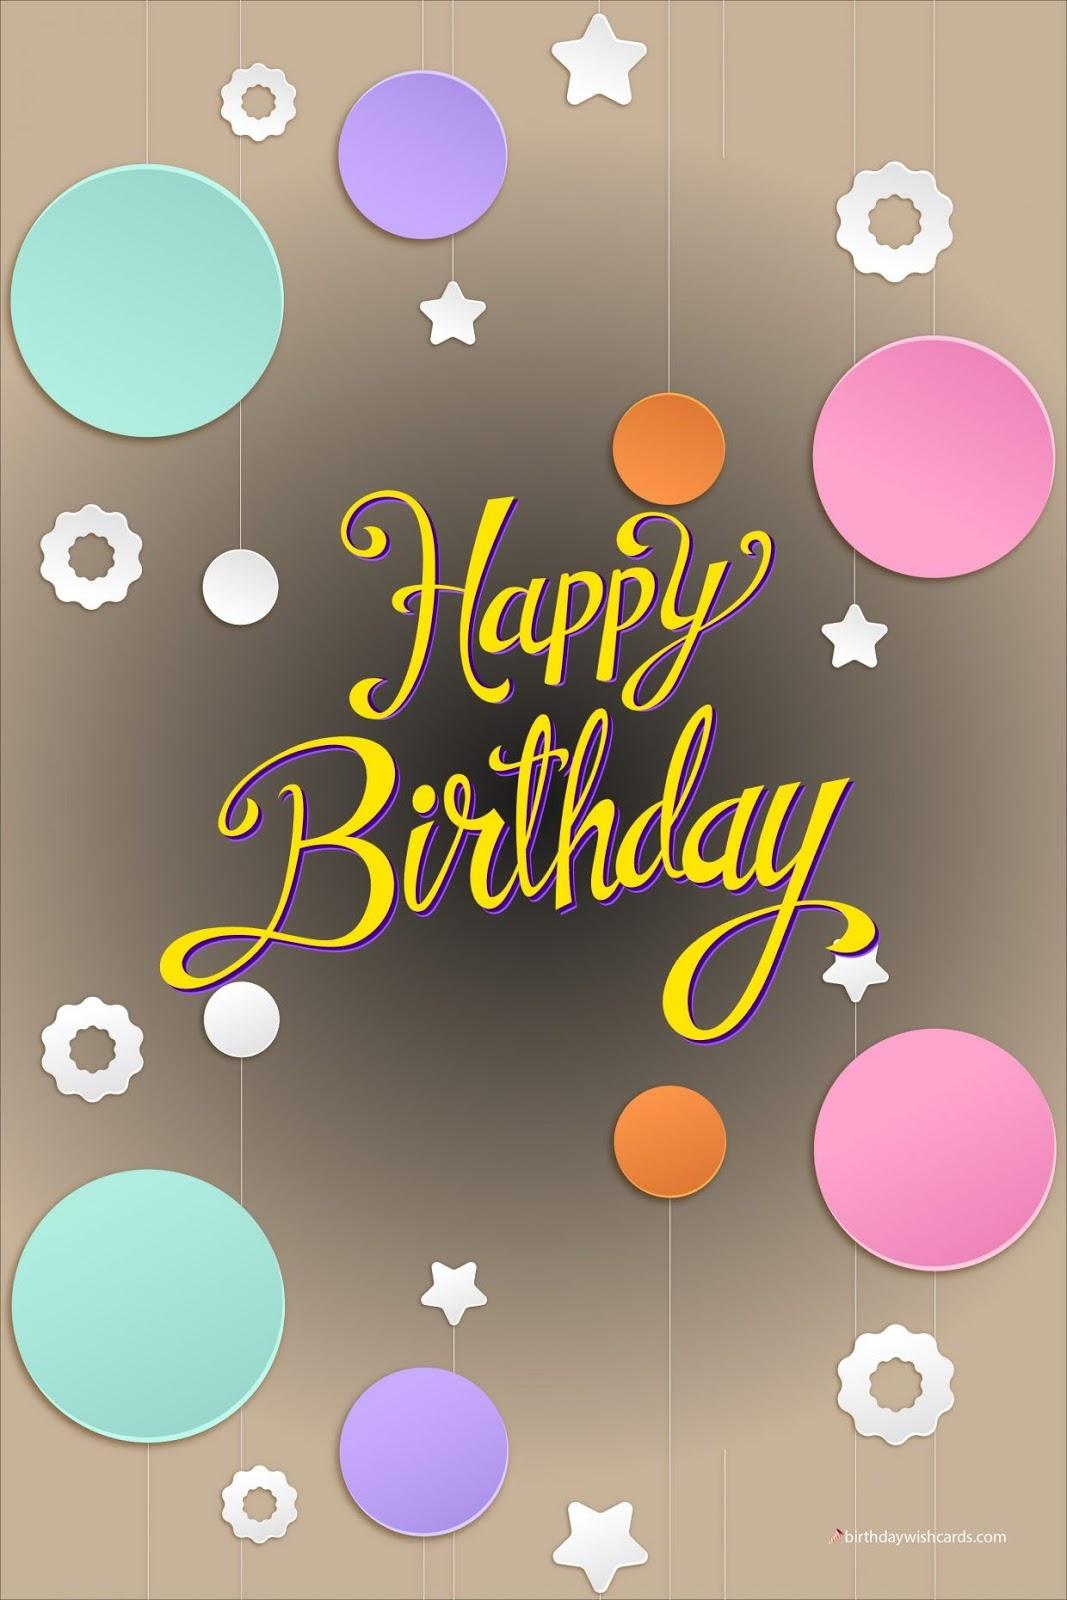 141 1419059 happy birthday logo hd backgrounds happy birthday hd